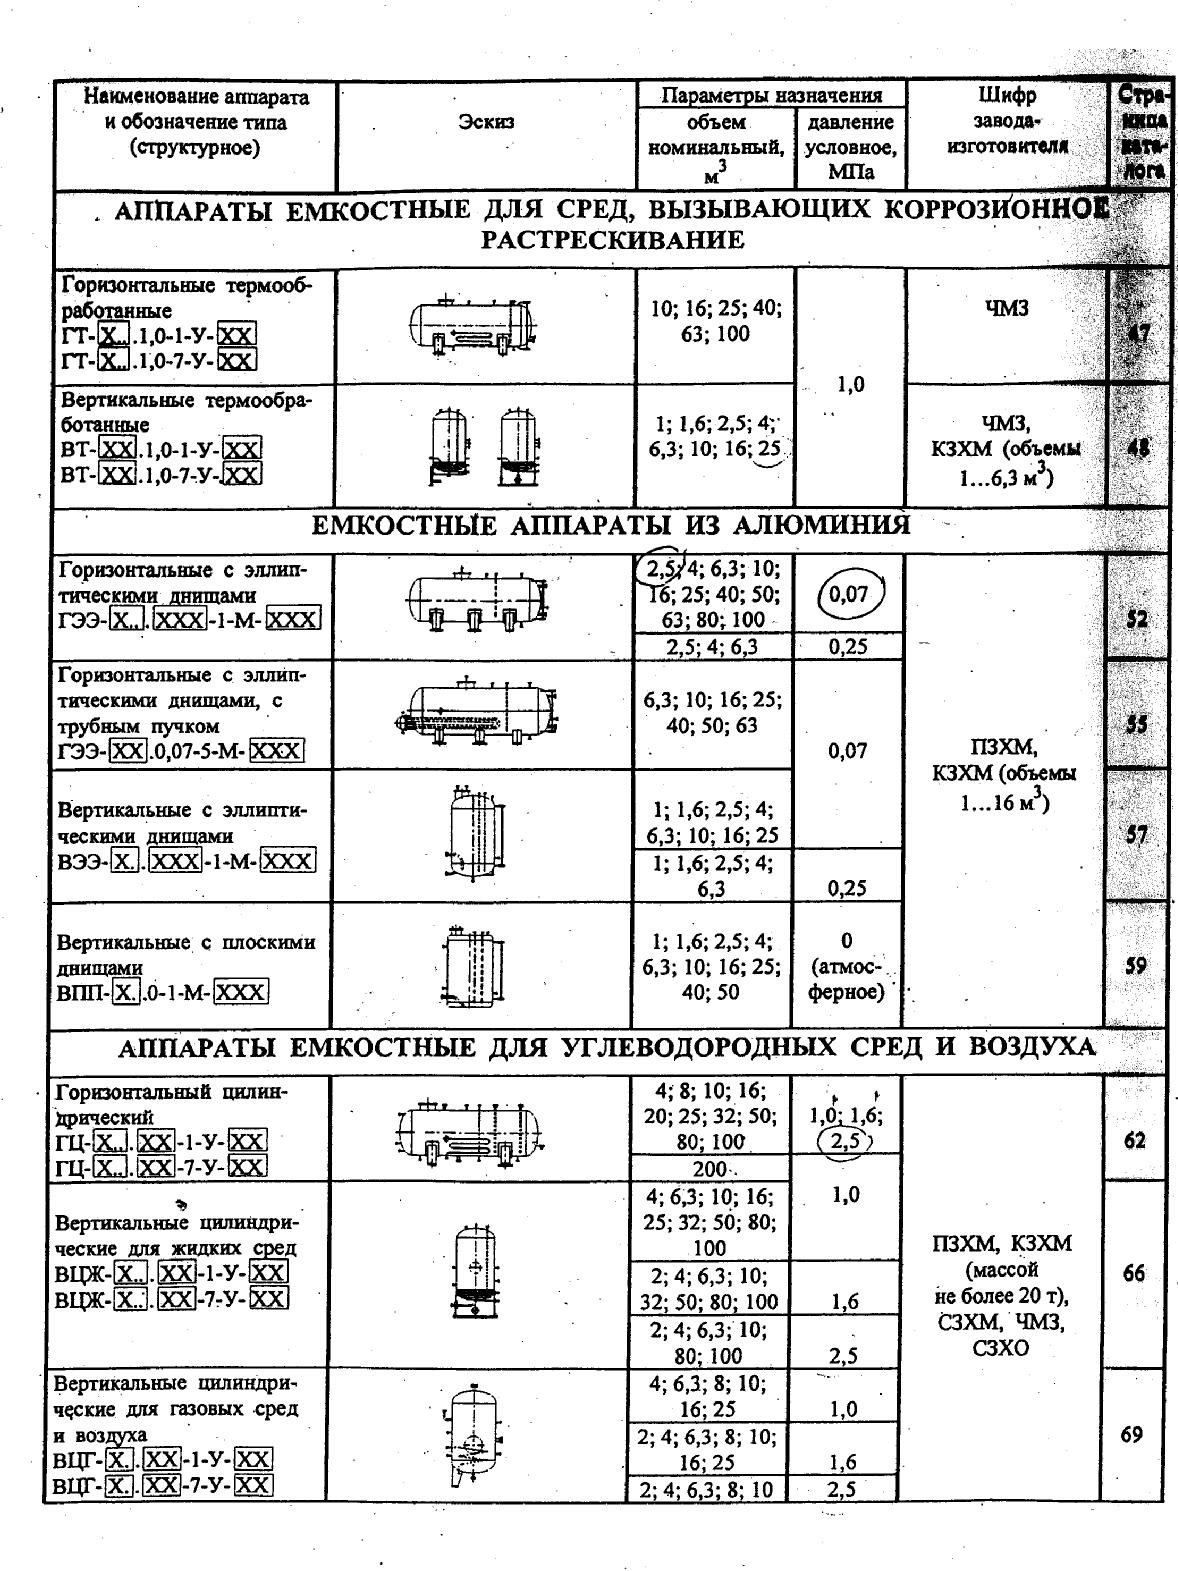 Каталог НИИХИММАШ: Емкостные аппараты